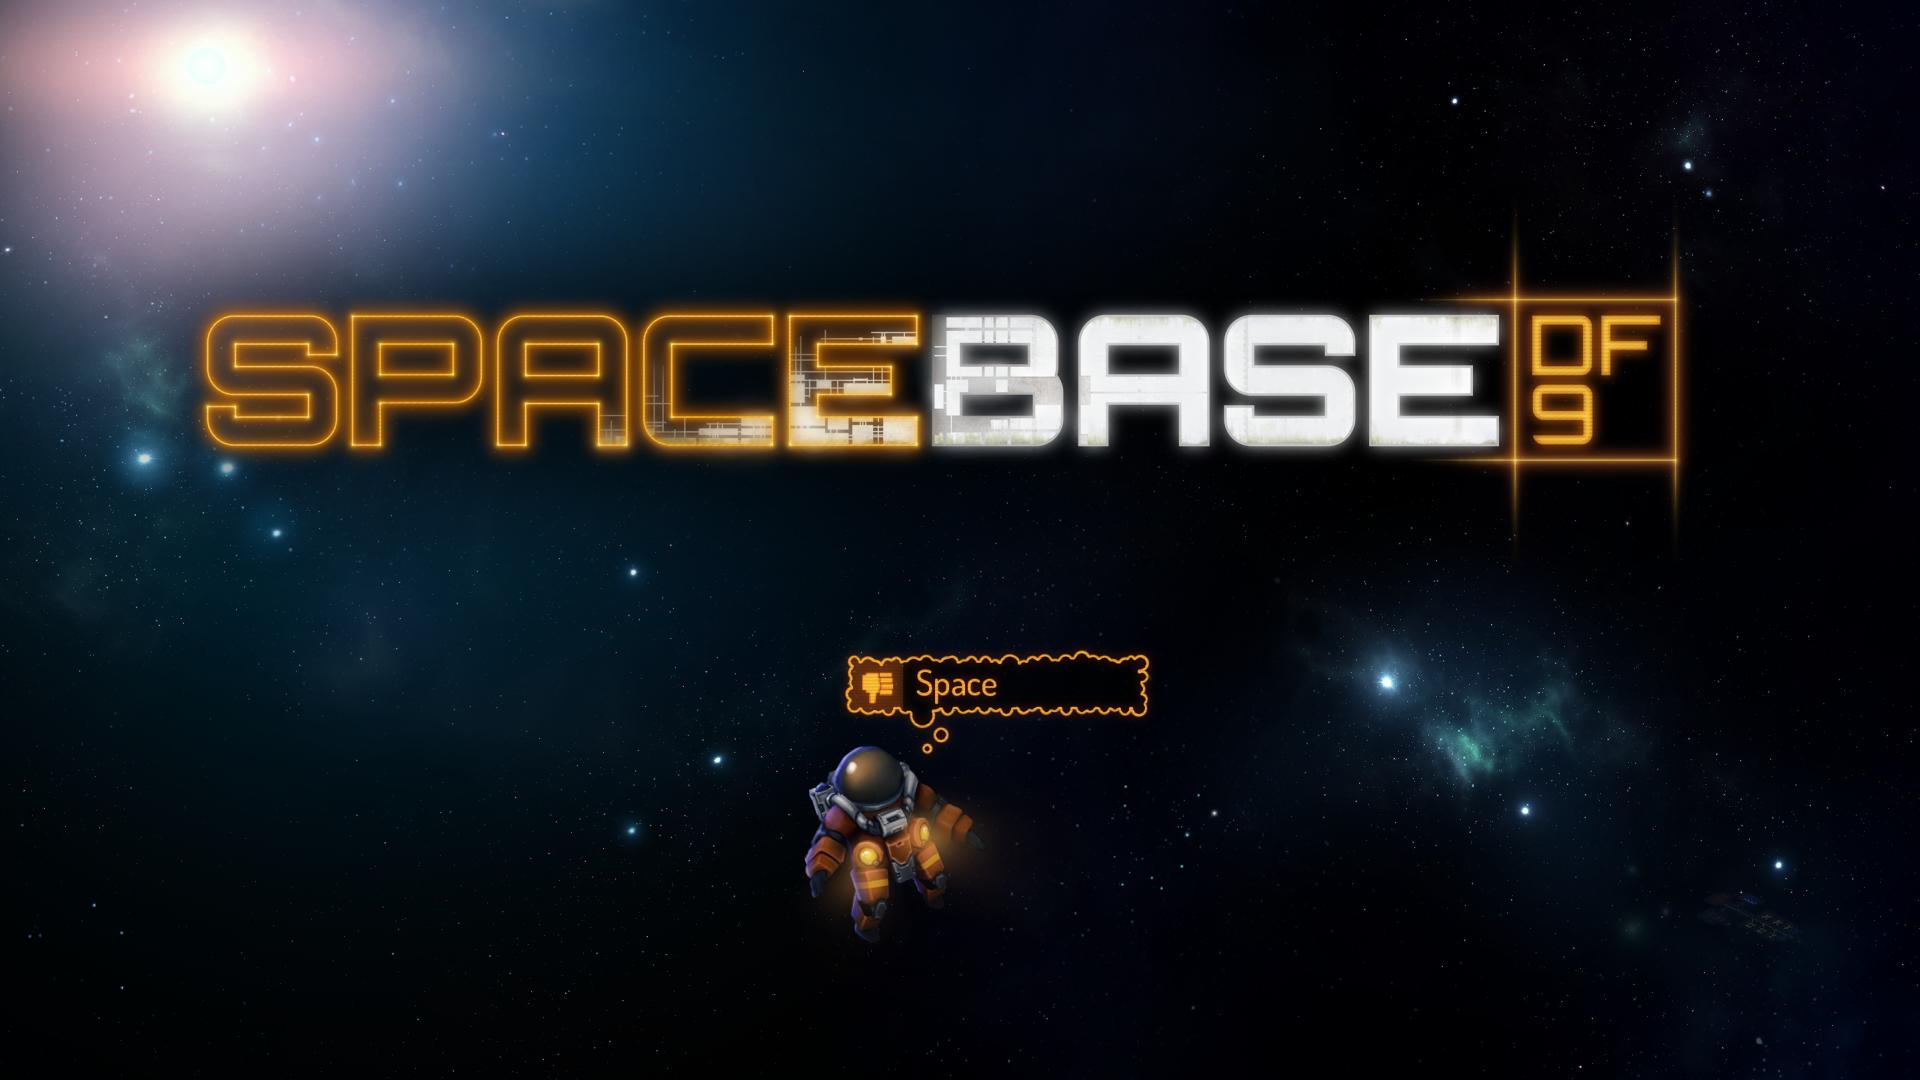 Spacebase DF-9 Wallpaper